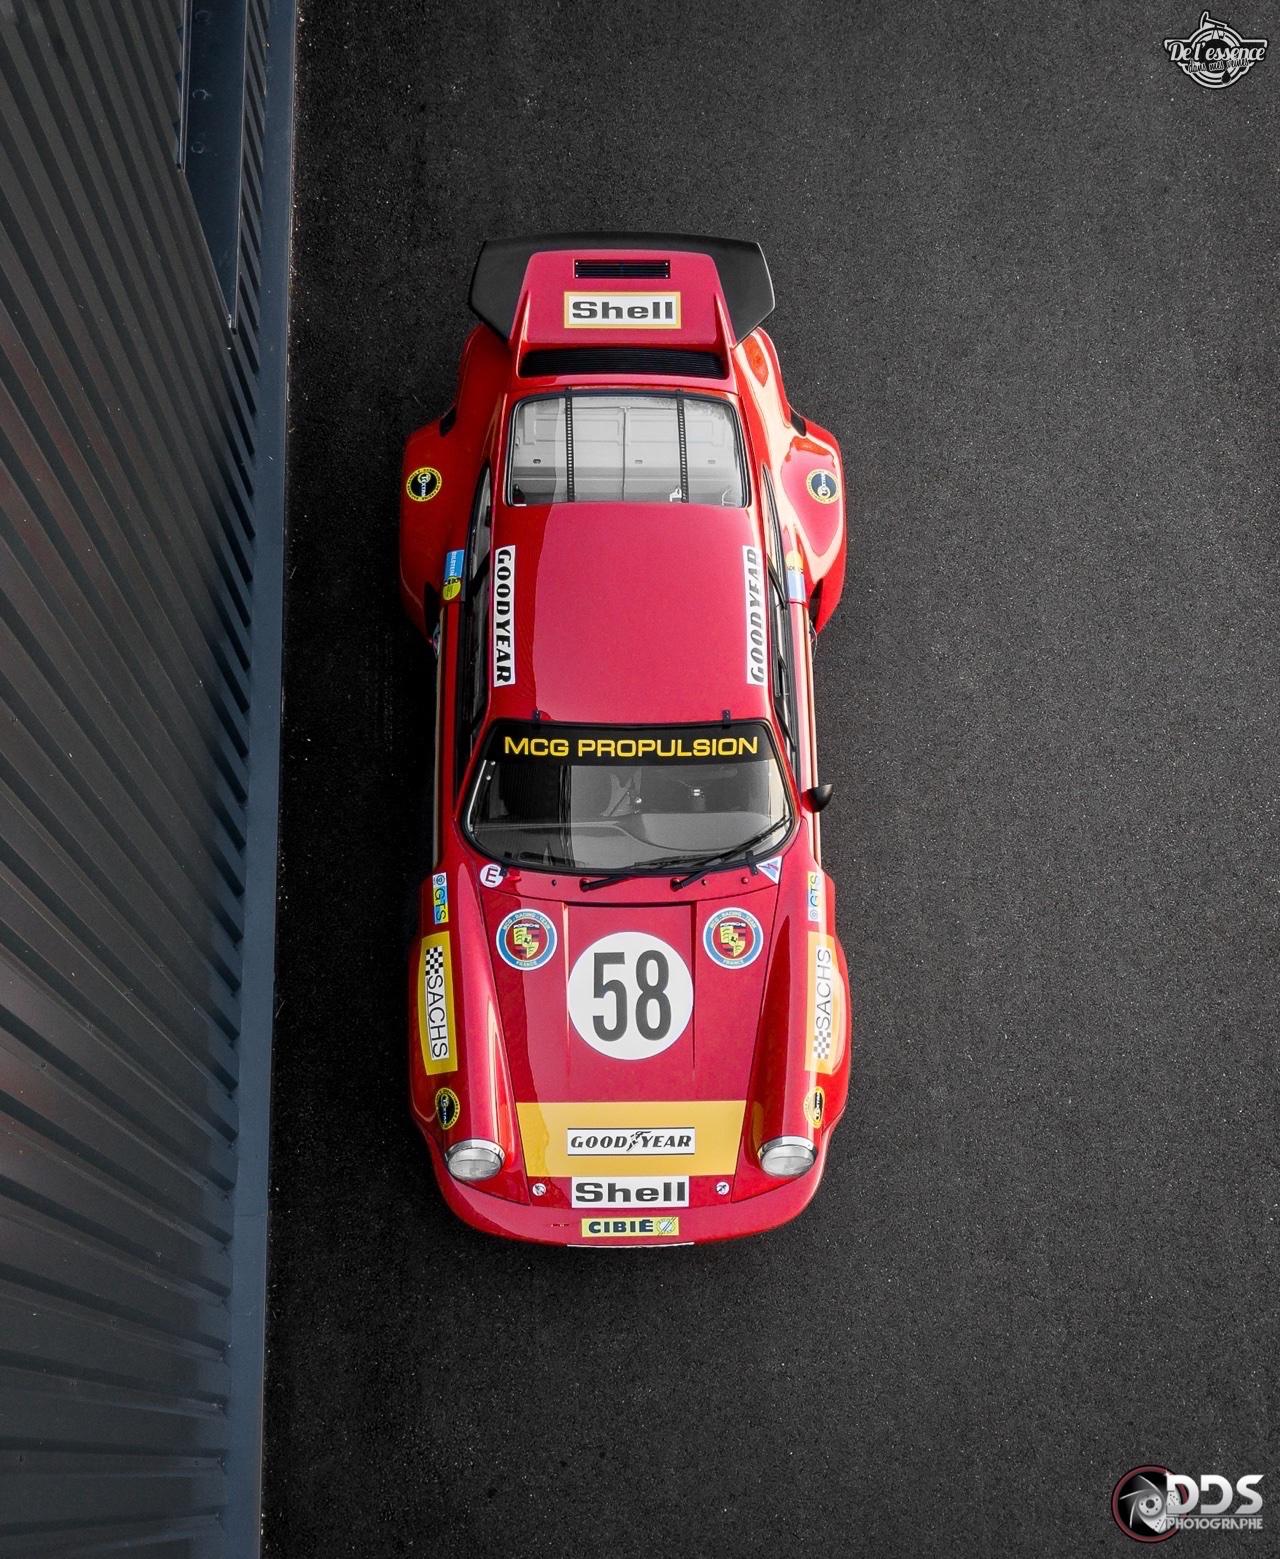 Porsche 911 RSR - 50% restomod, 50% course, 100% MCG Propulsion 2